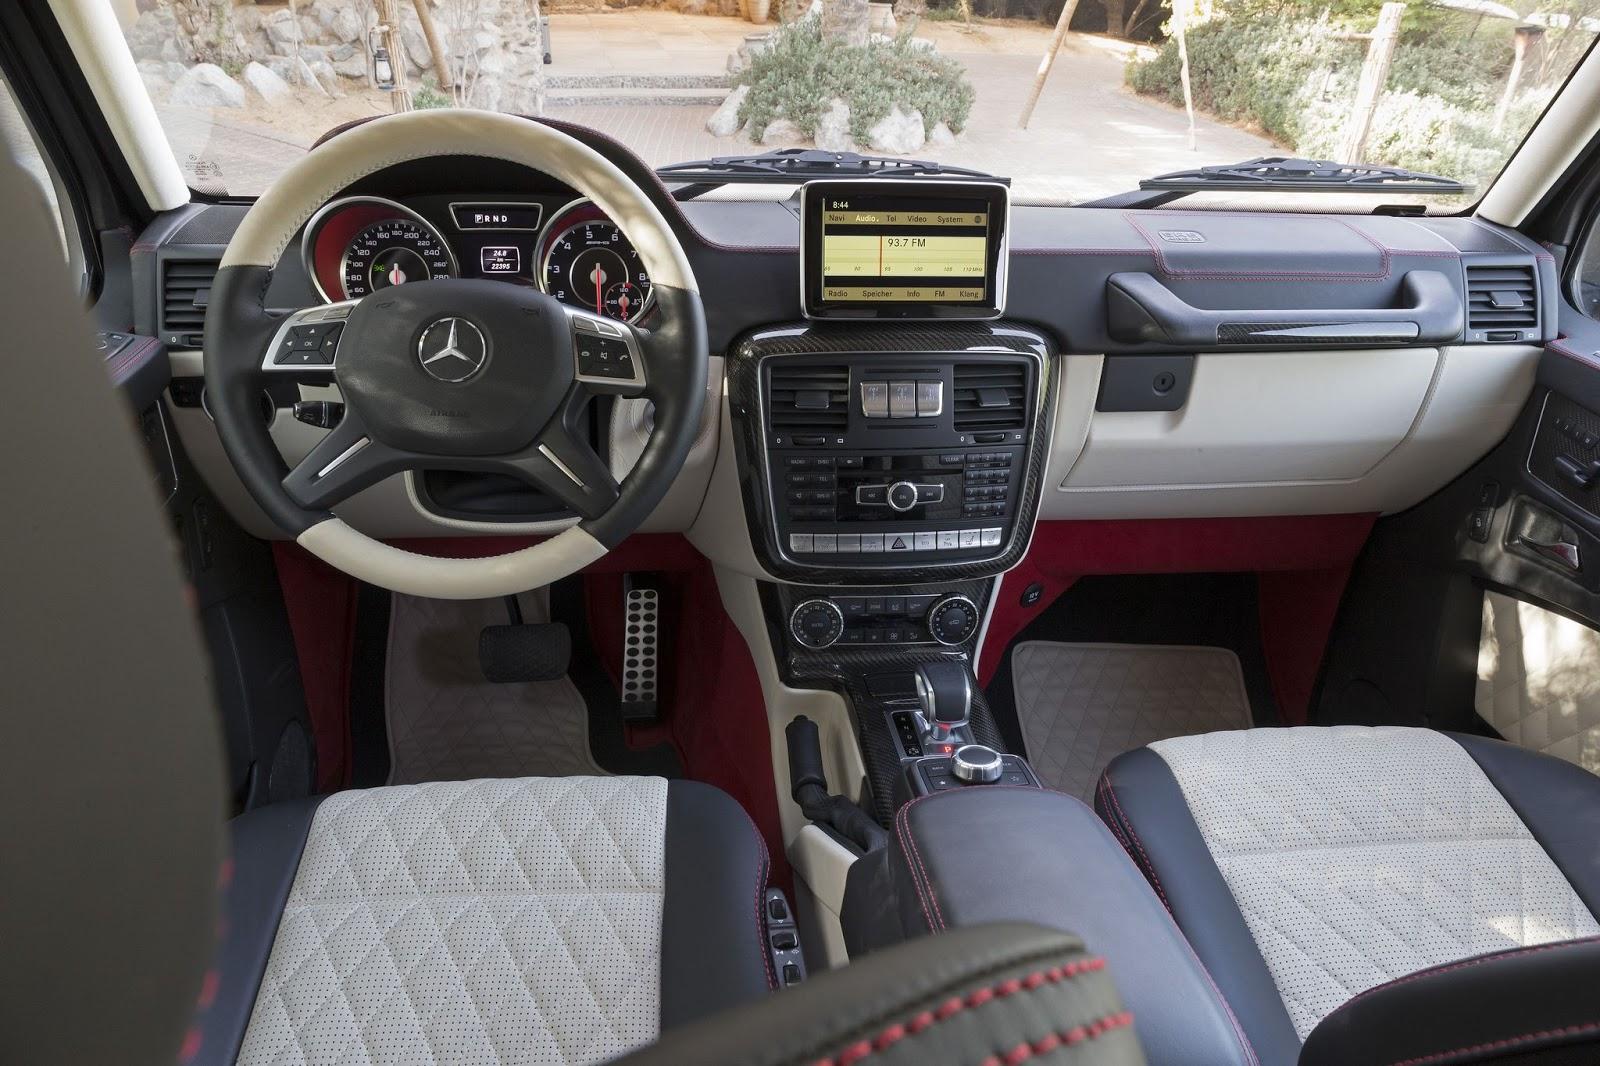 Black Brabus G63 AMG | Mercedes g63, Mercedes g, Mercedes